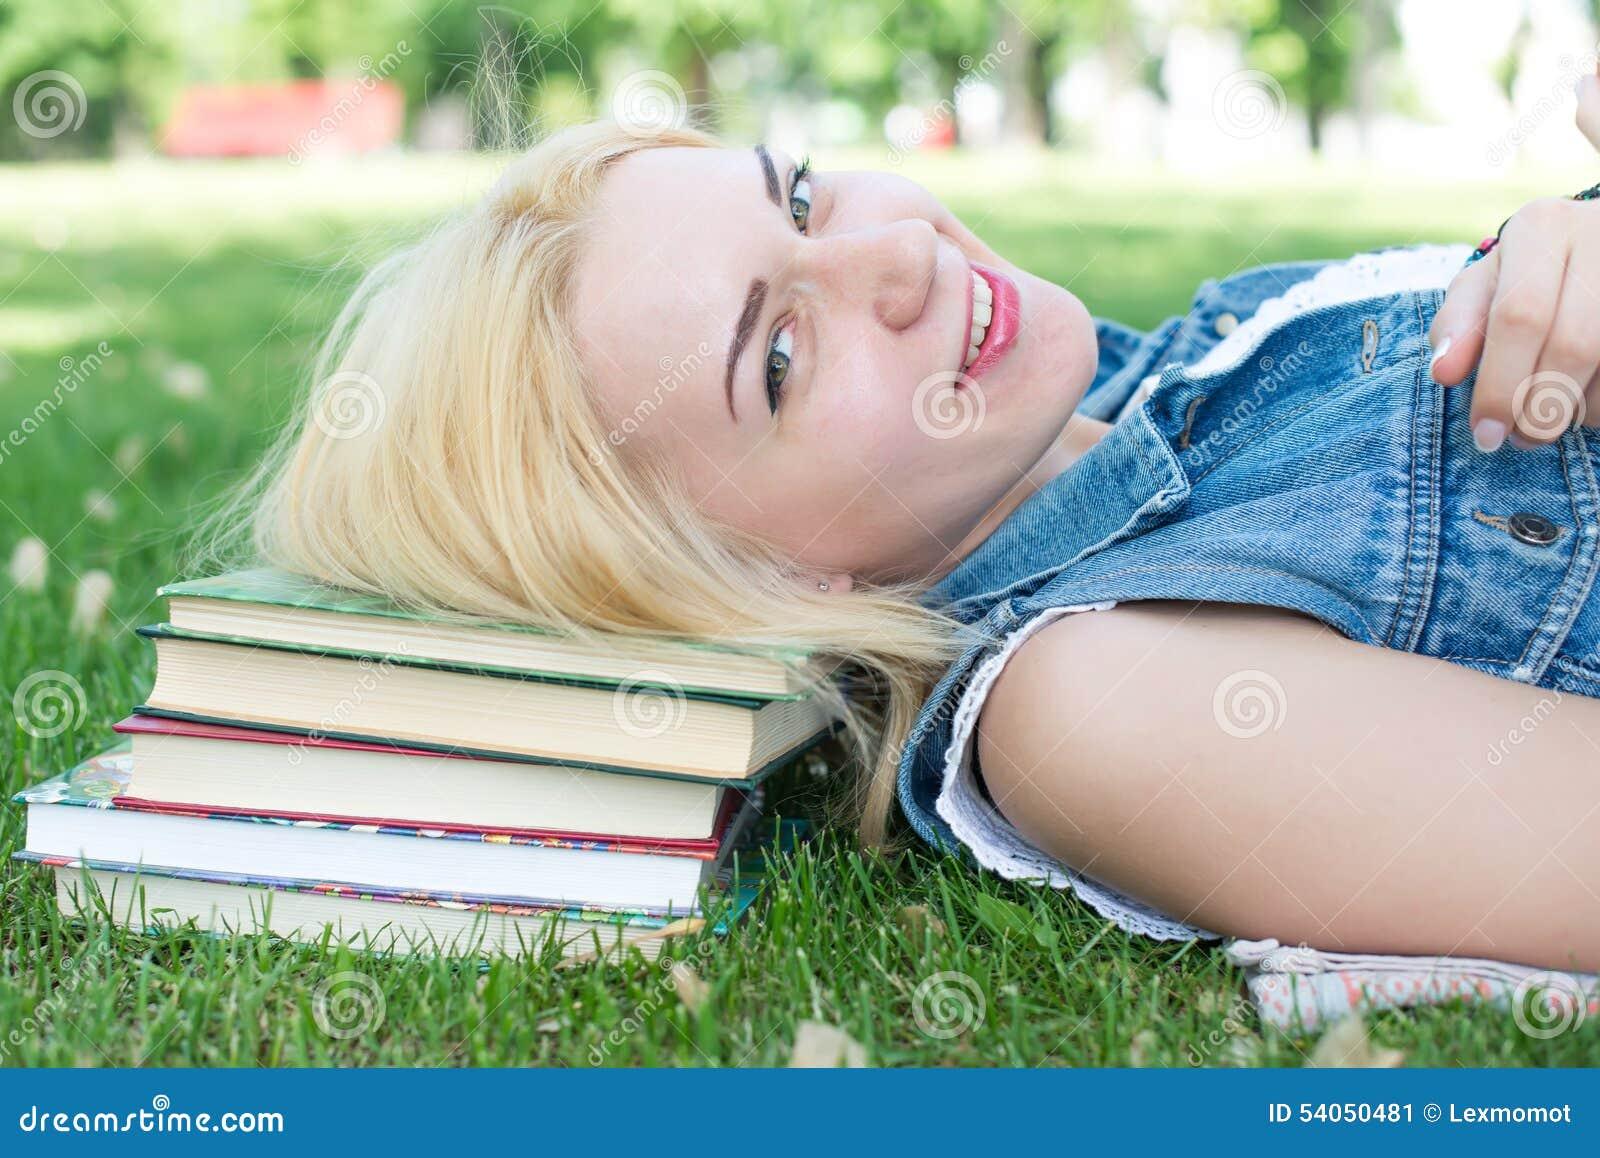 Mooie glimlachende jonge vrouw die op gras liggen